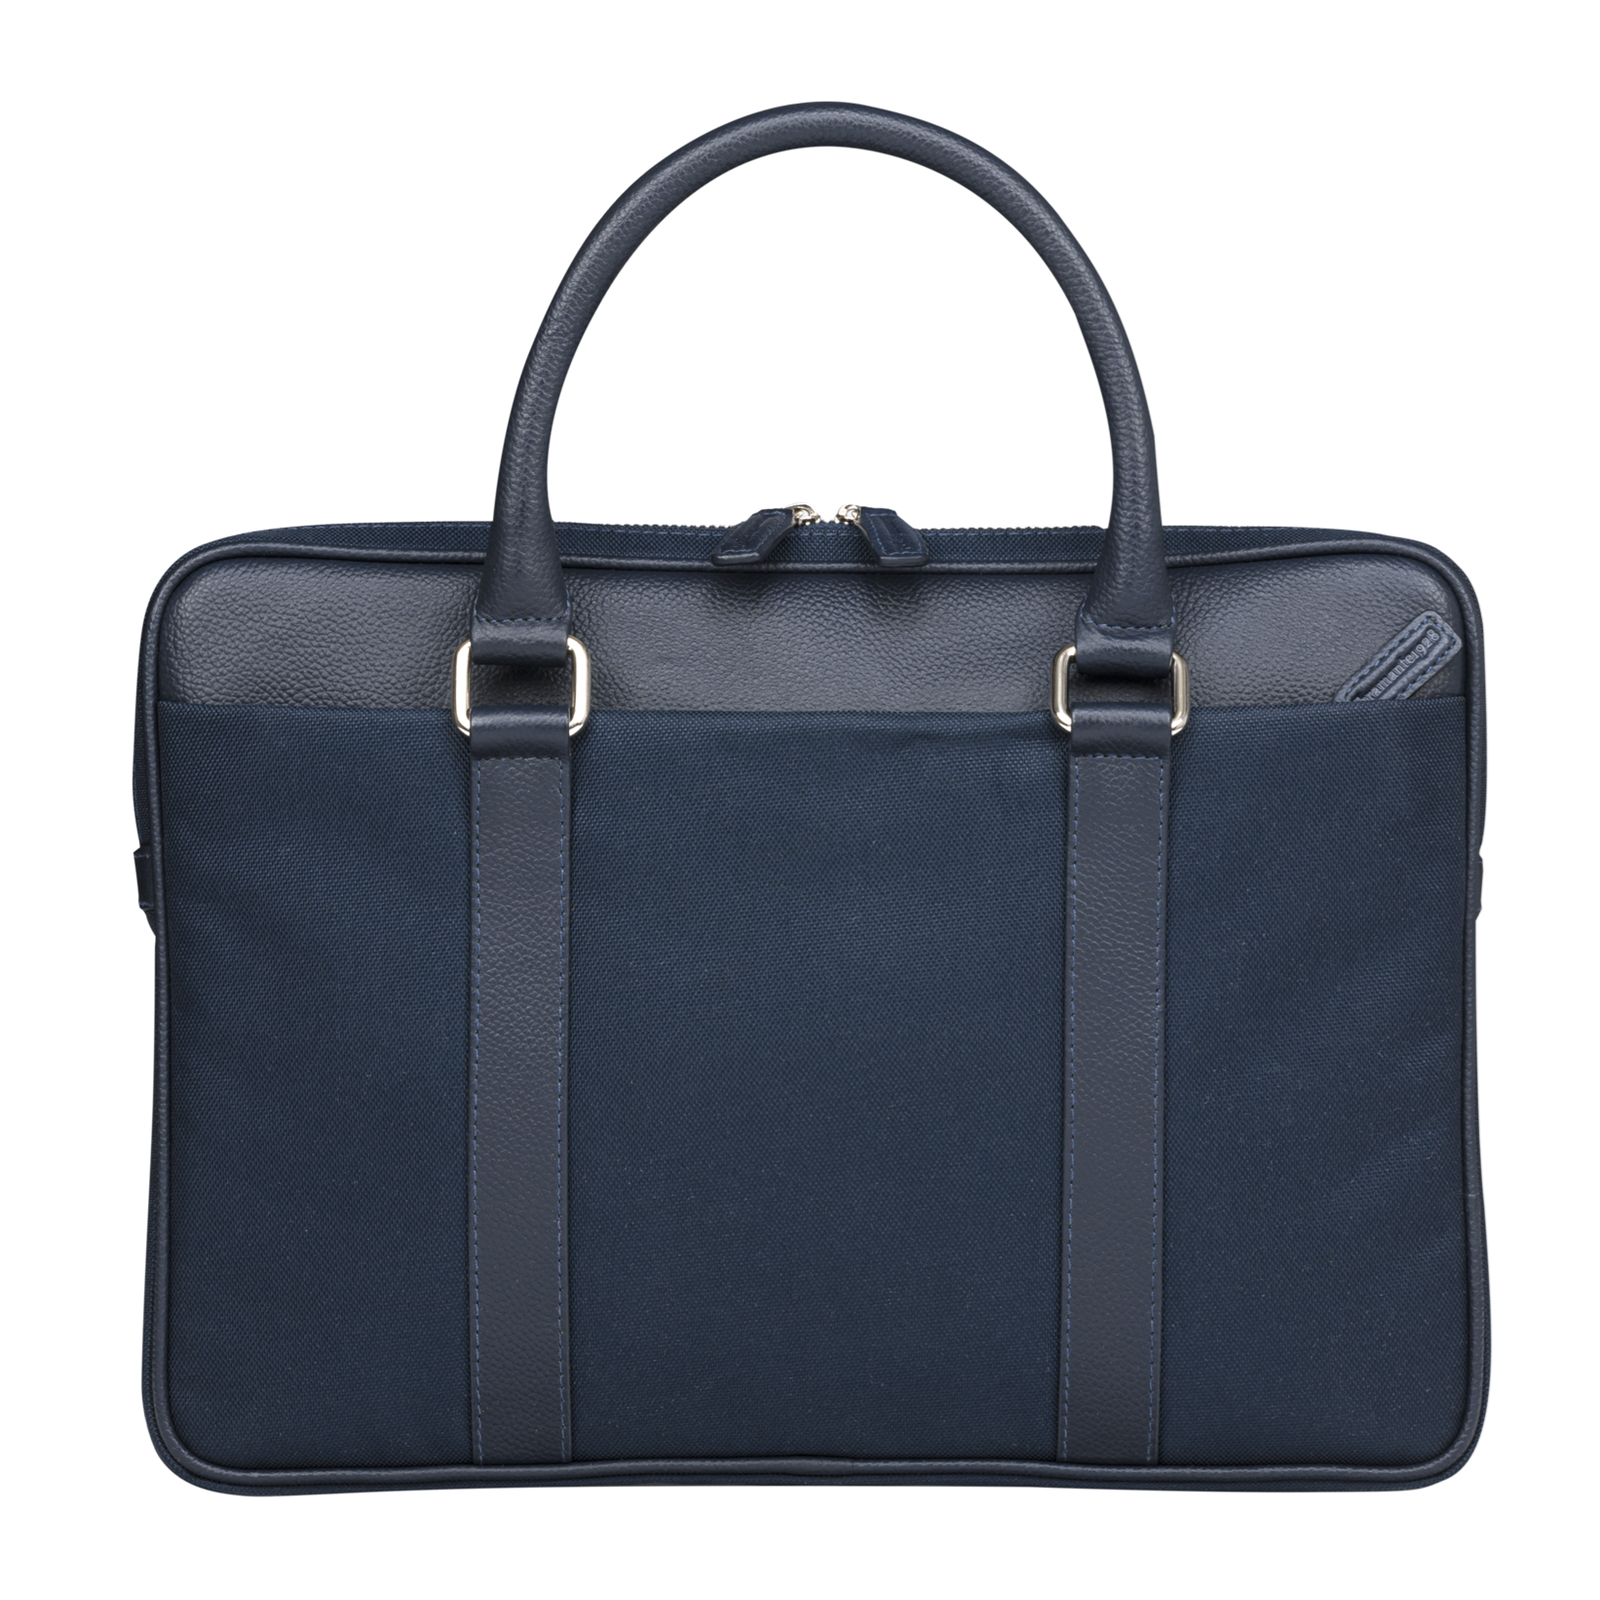 Dbramante1928 14'' Slim Laptop Bag Stelvio (Avenue), Navy Blue